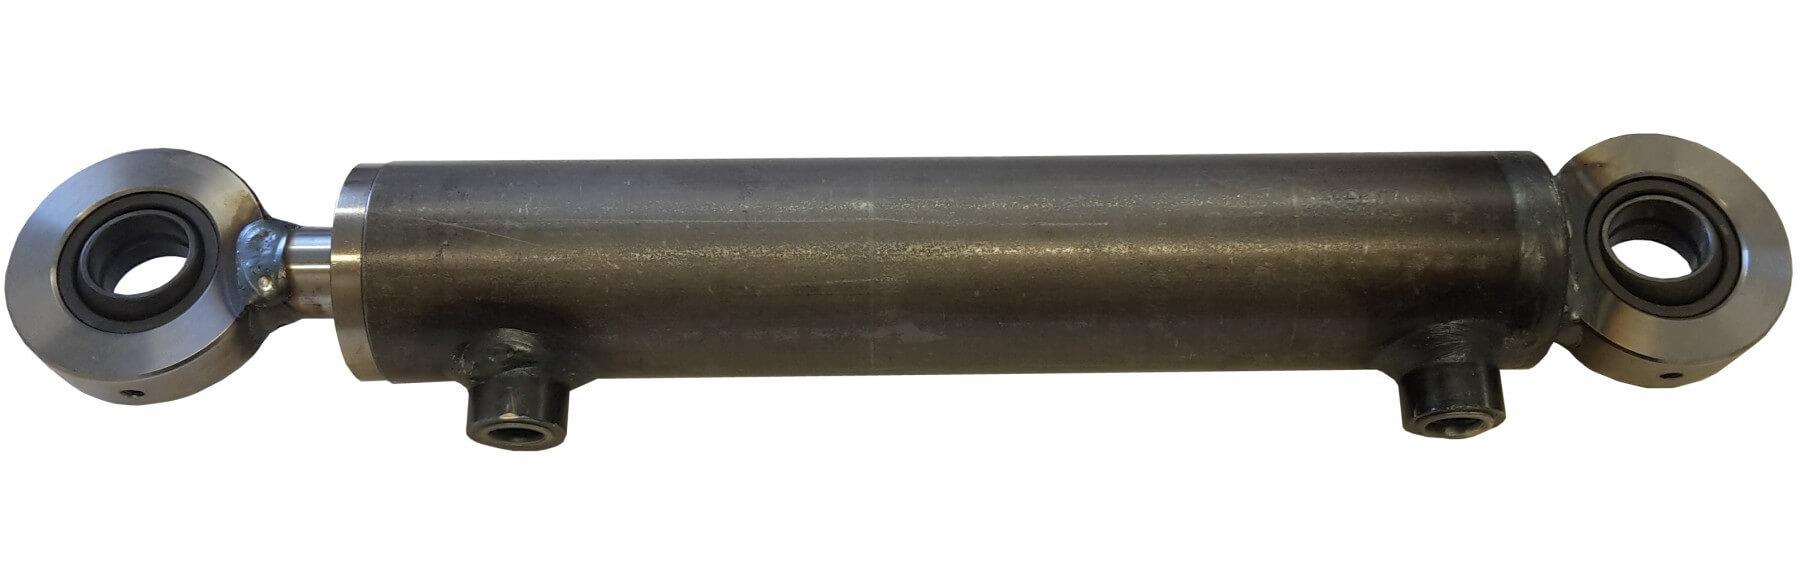 Hydraulisylinteri CL 100. 60. 300 GE